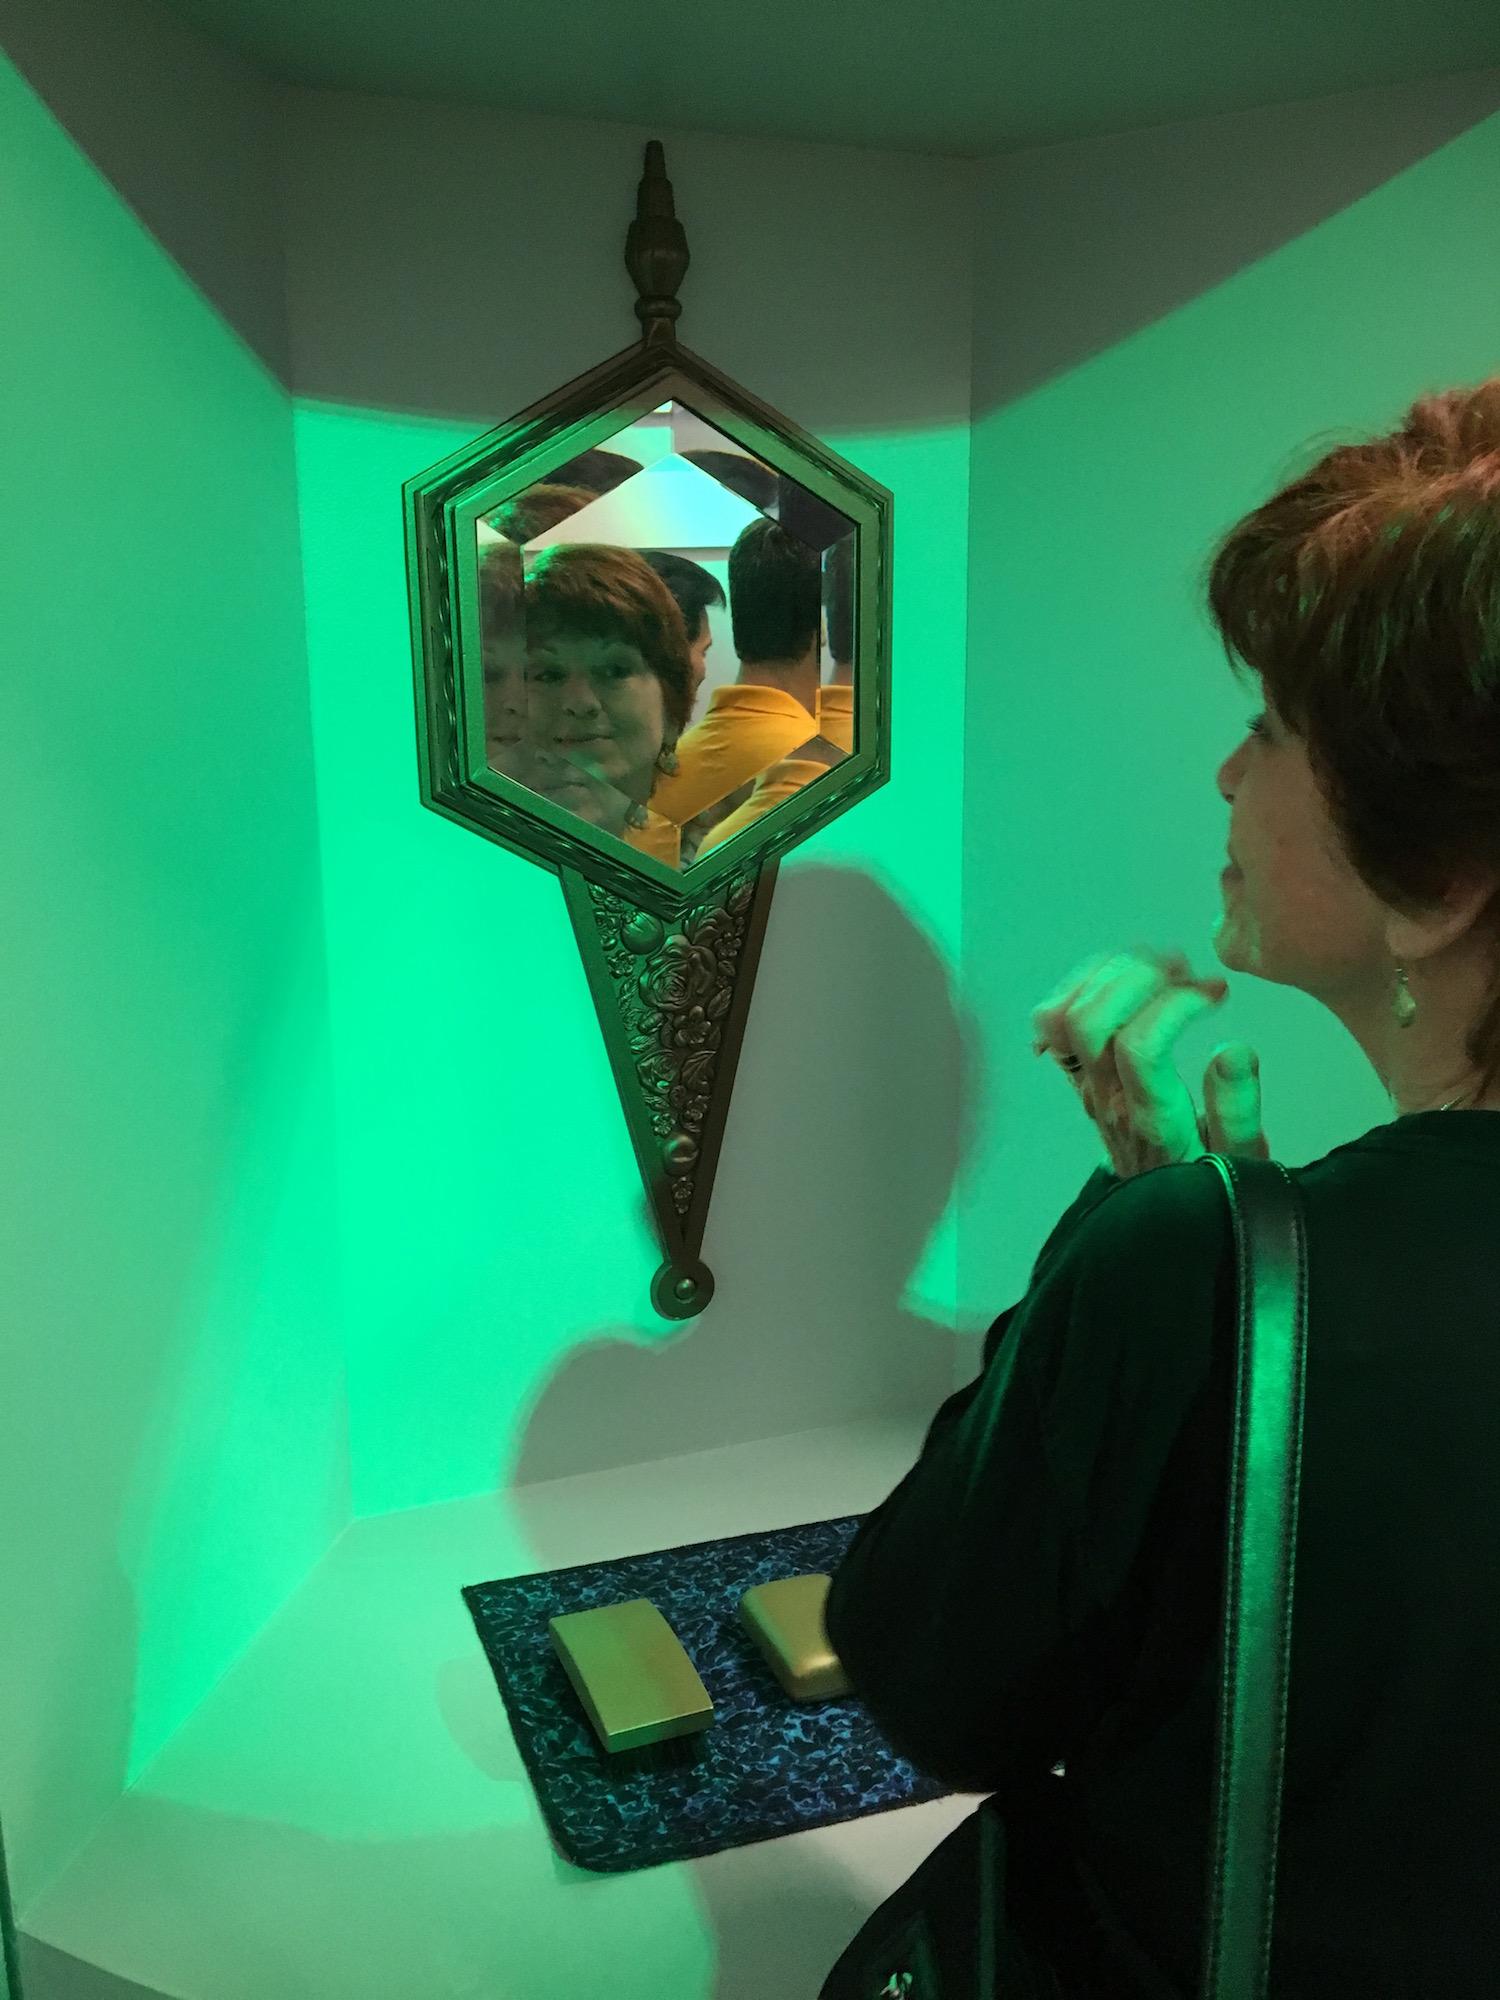 Karen Ragan-George Gazing into Captain Kirk's Mirror ©2017 David R. George III